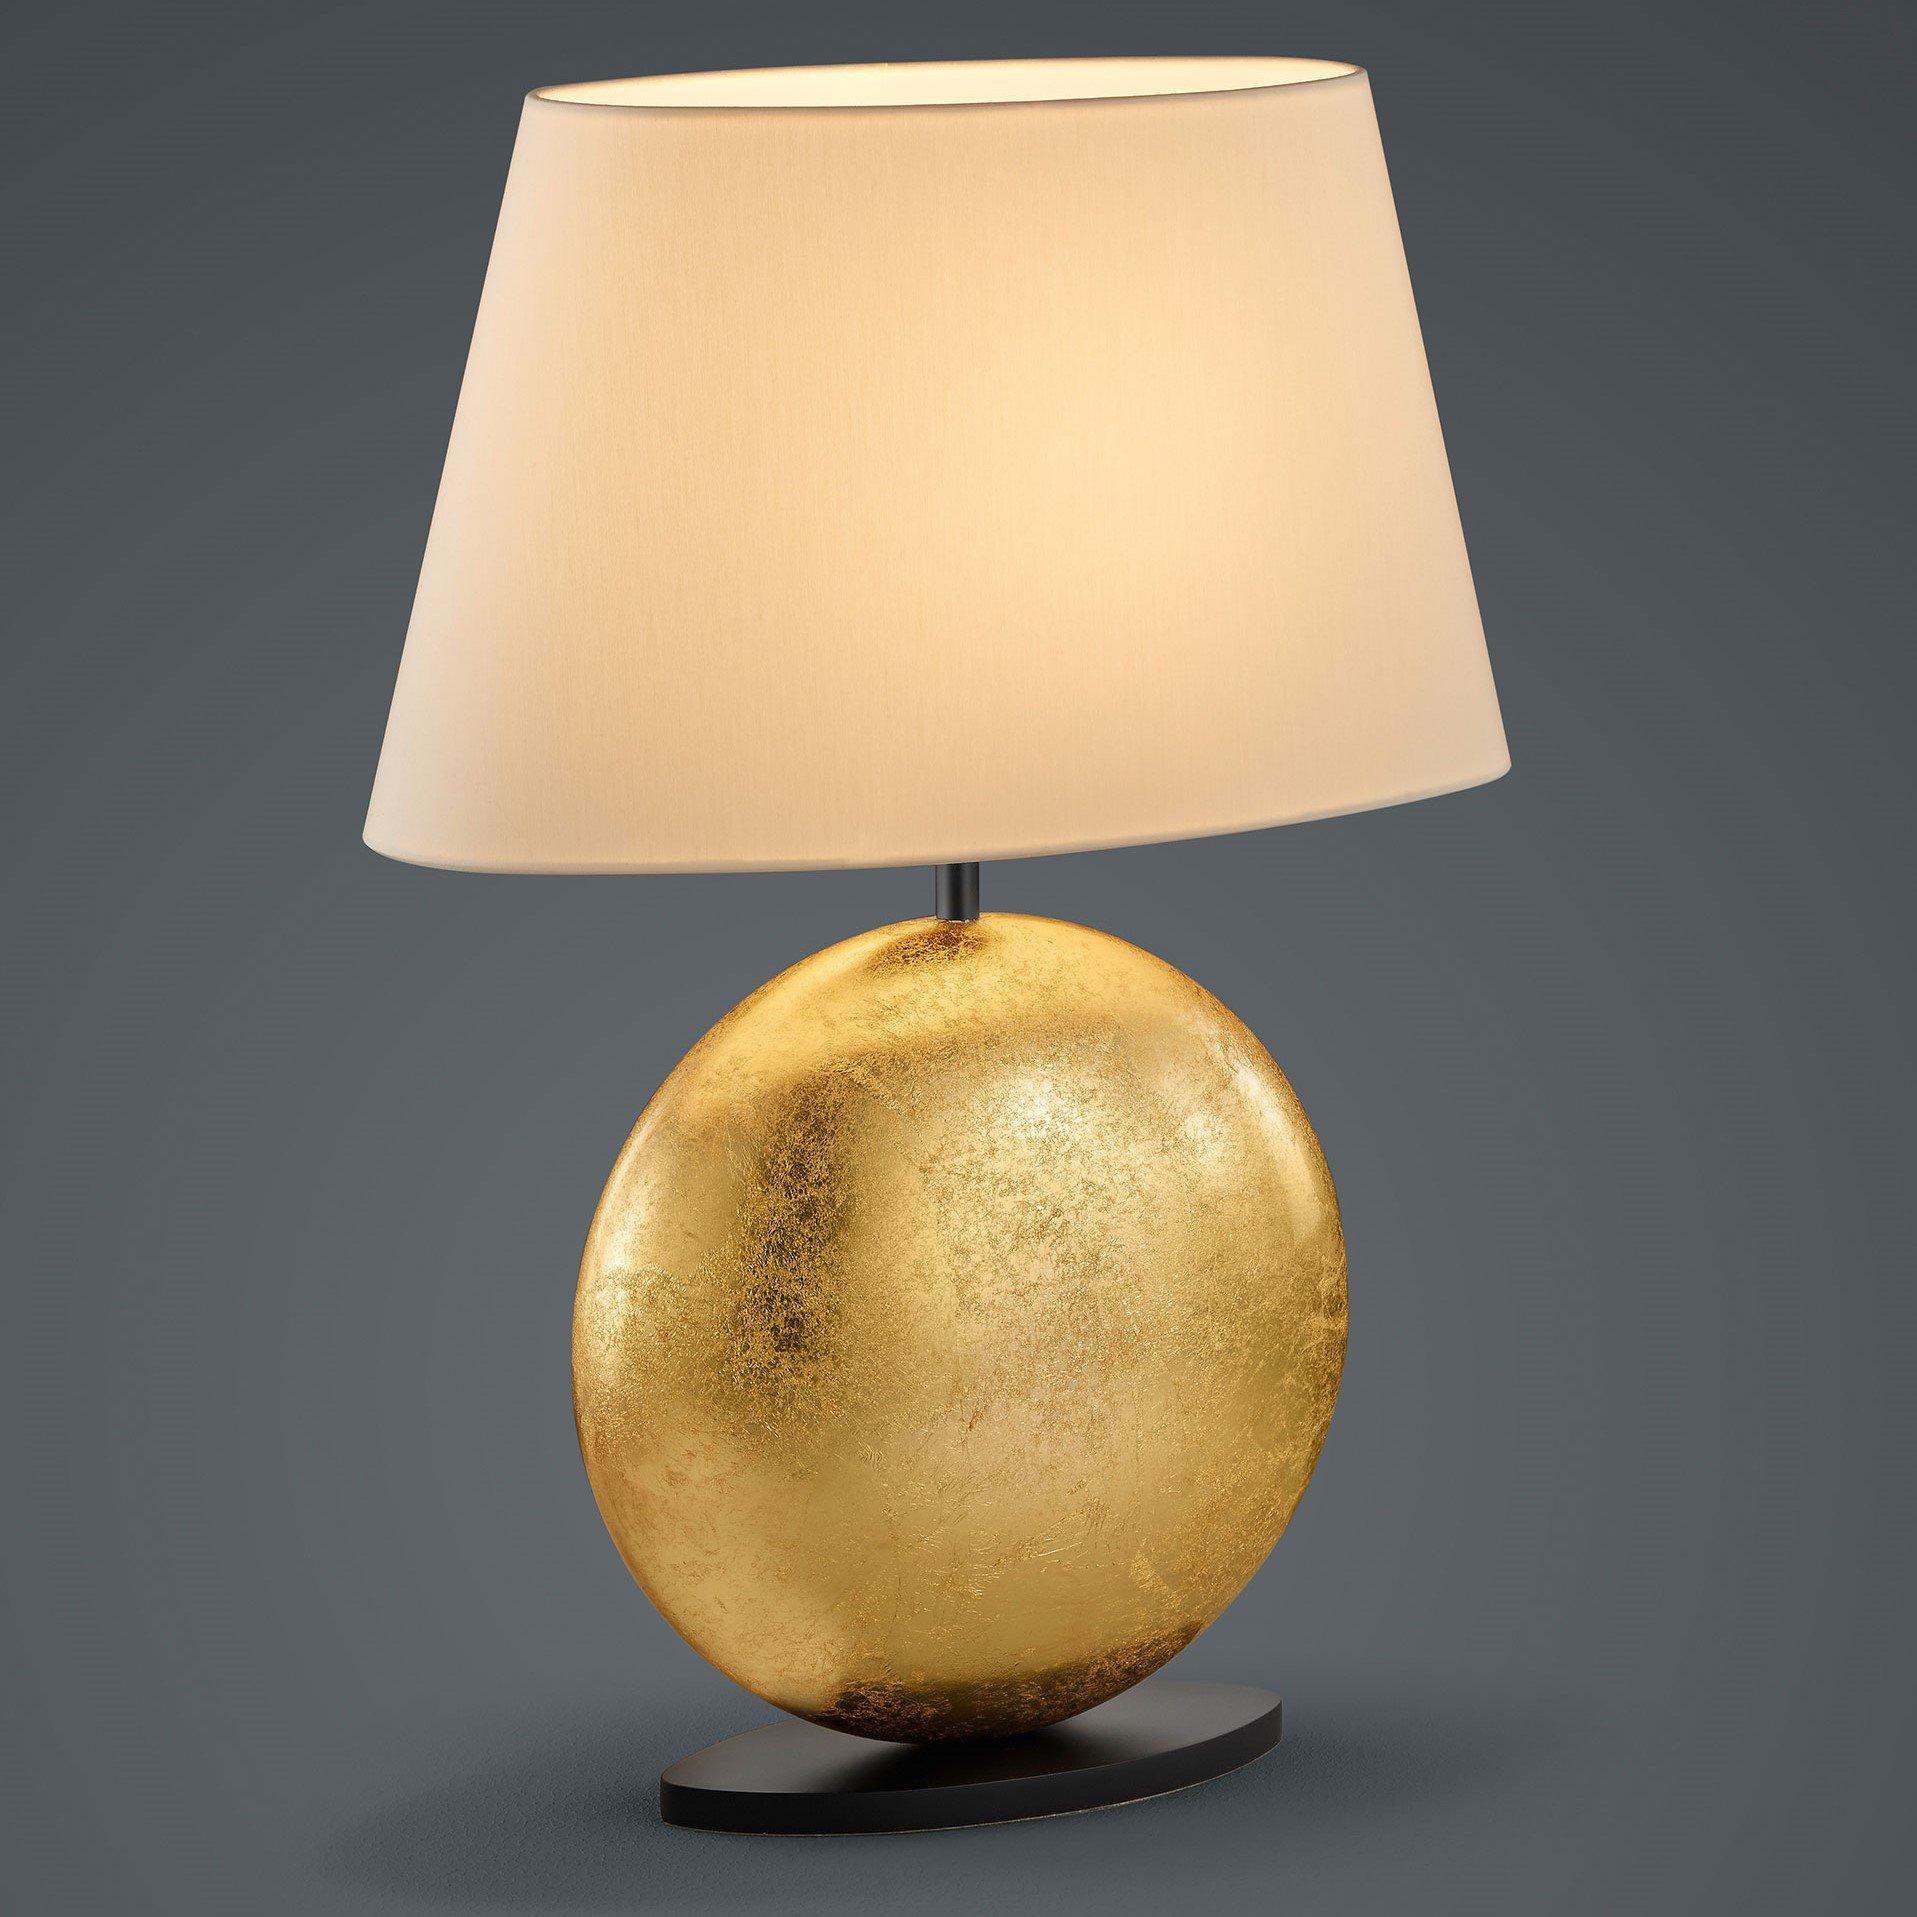 Tafellamp Luce Elevata Mali Groot Inclusief Kap